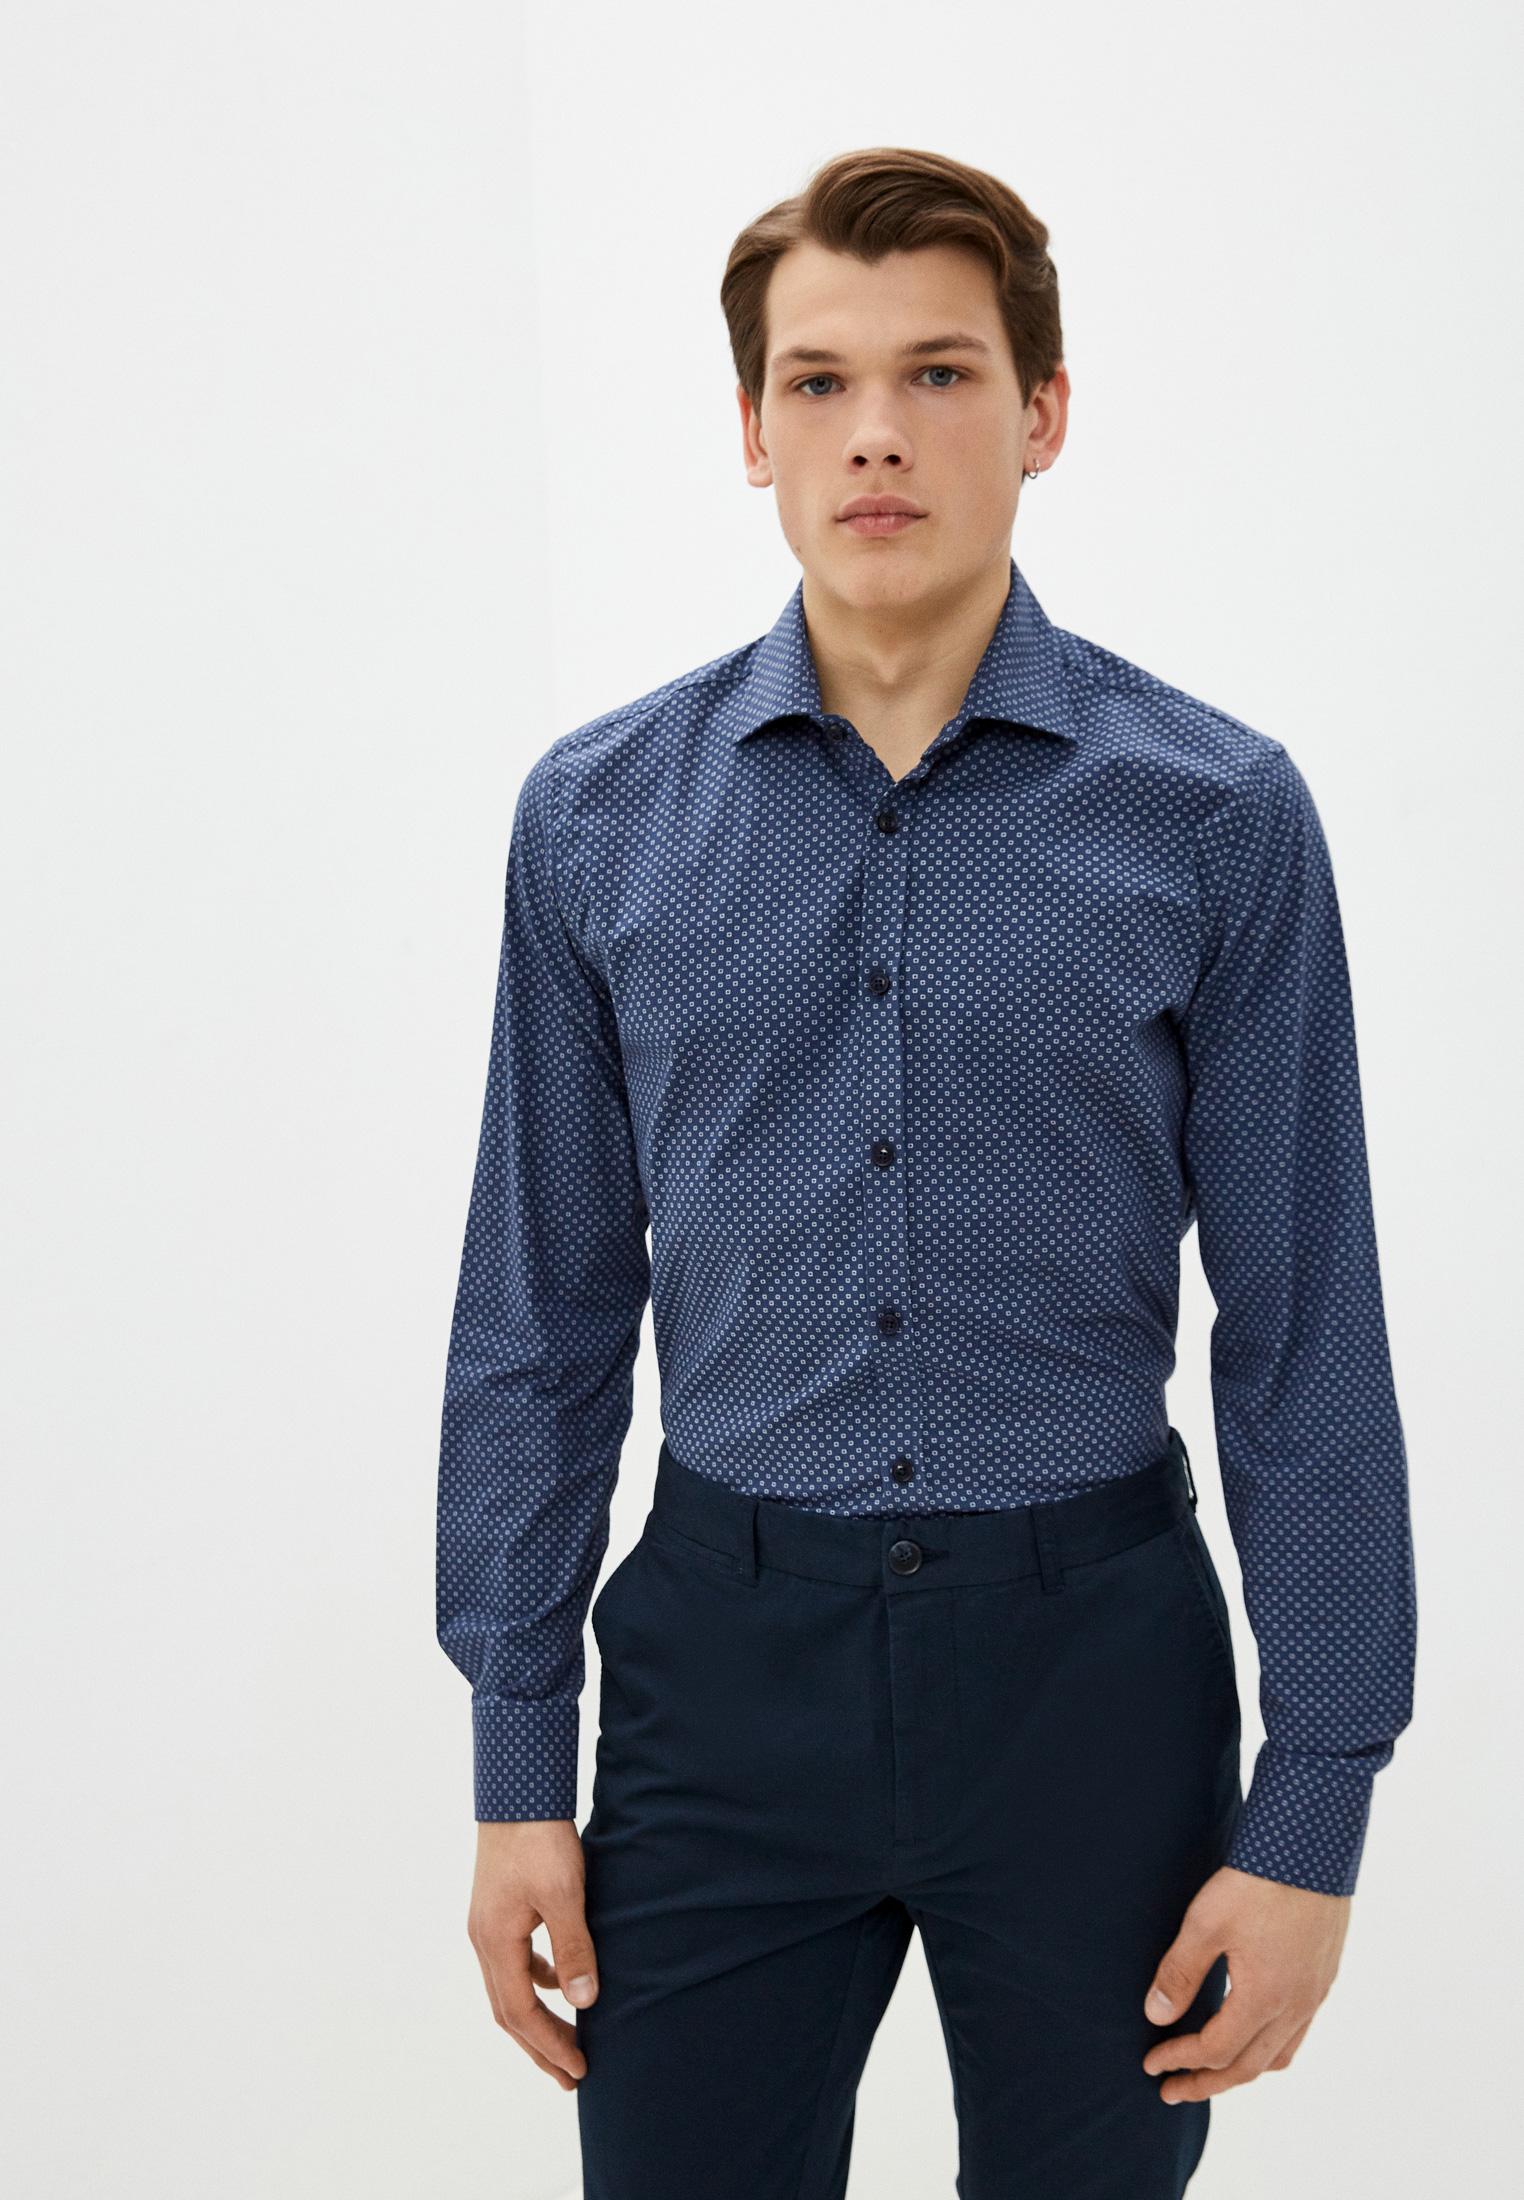 Рубашка с длинным рукавом JIMMY SANDERS (Джимми Сандерс) 20S JSMSHT0007